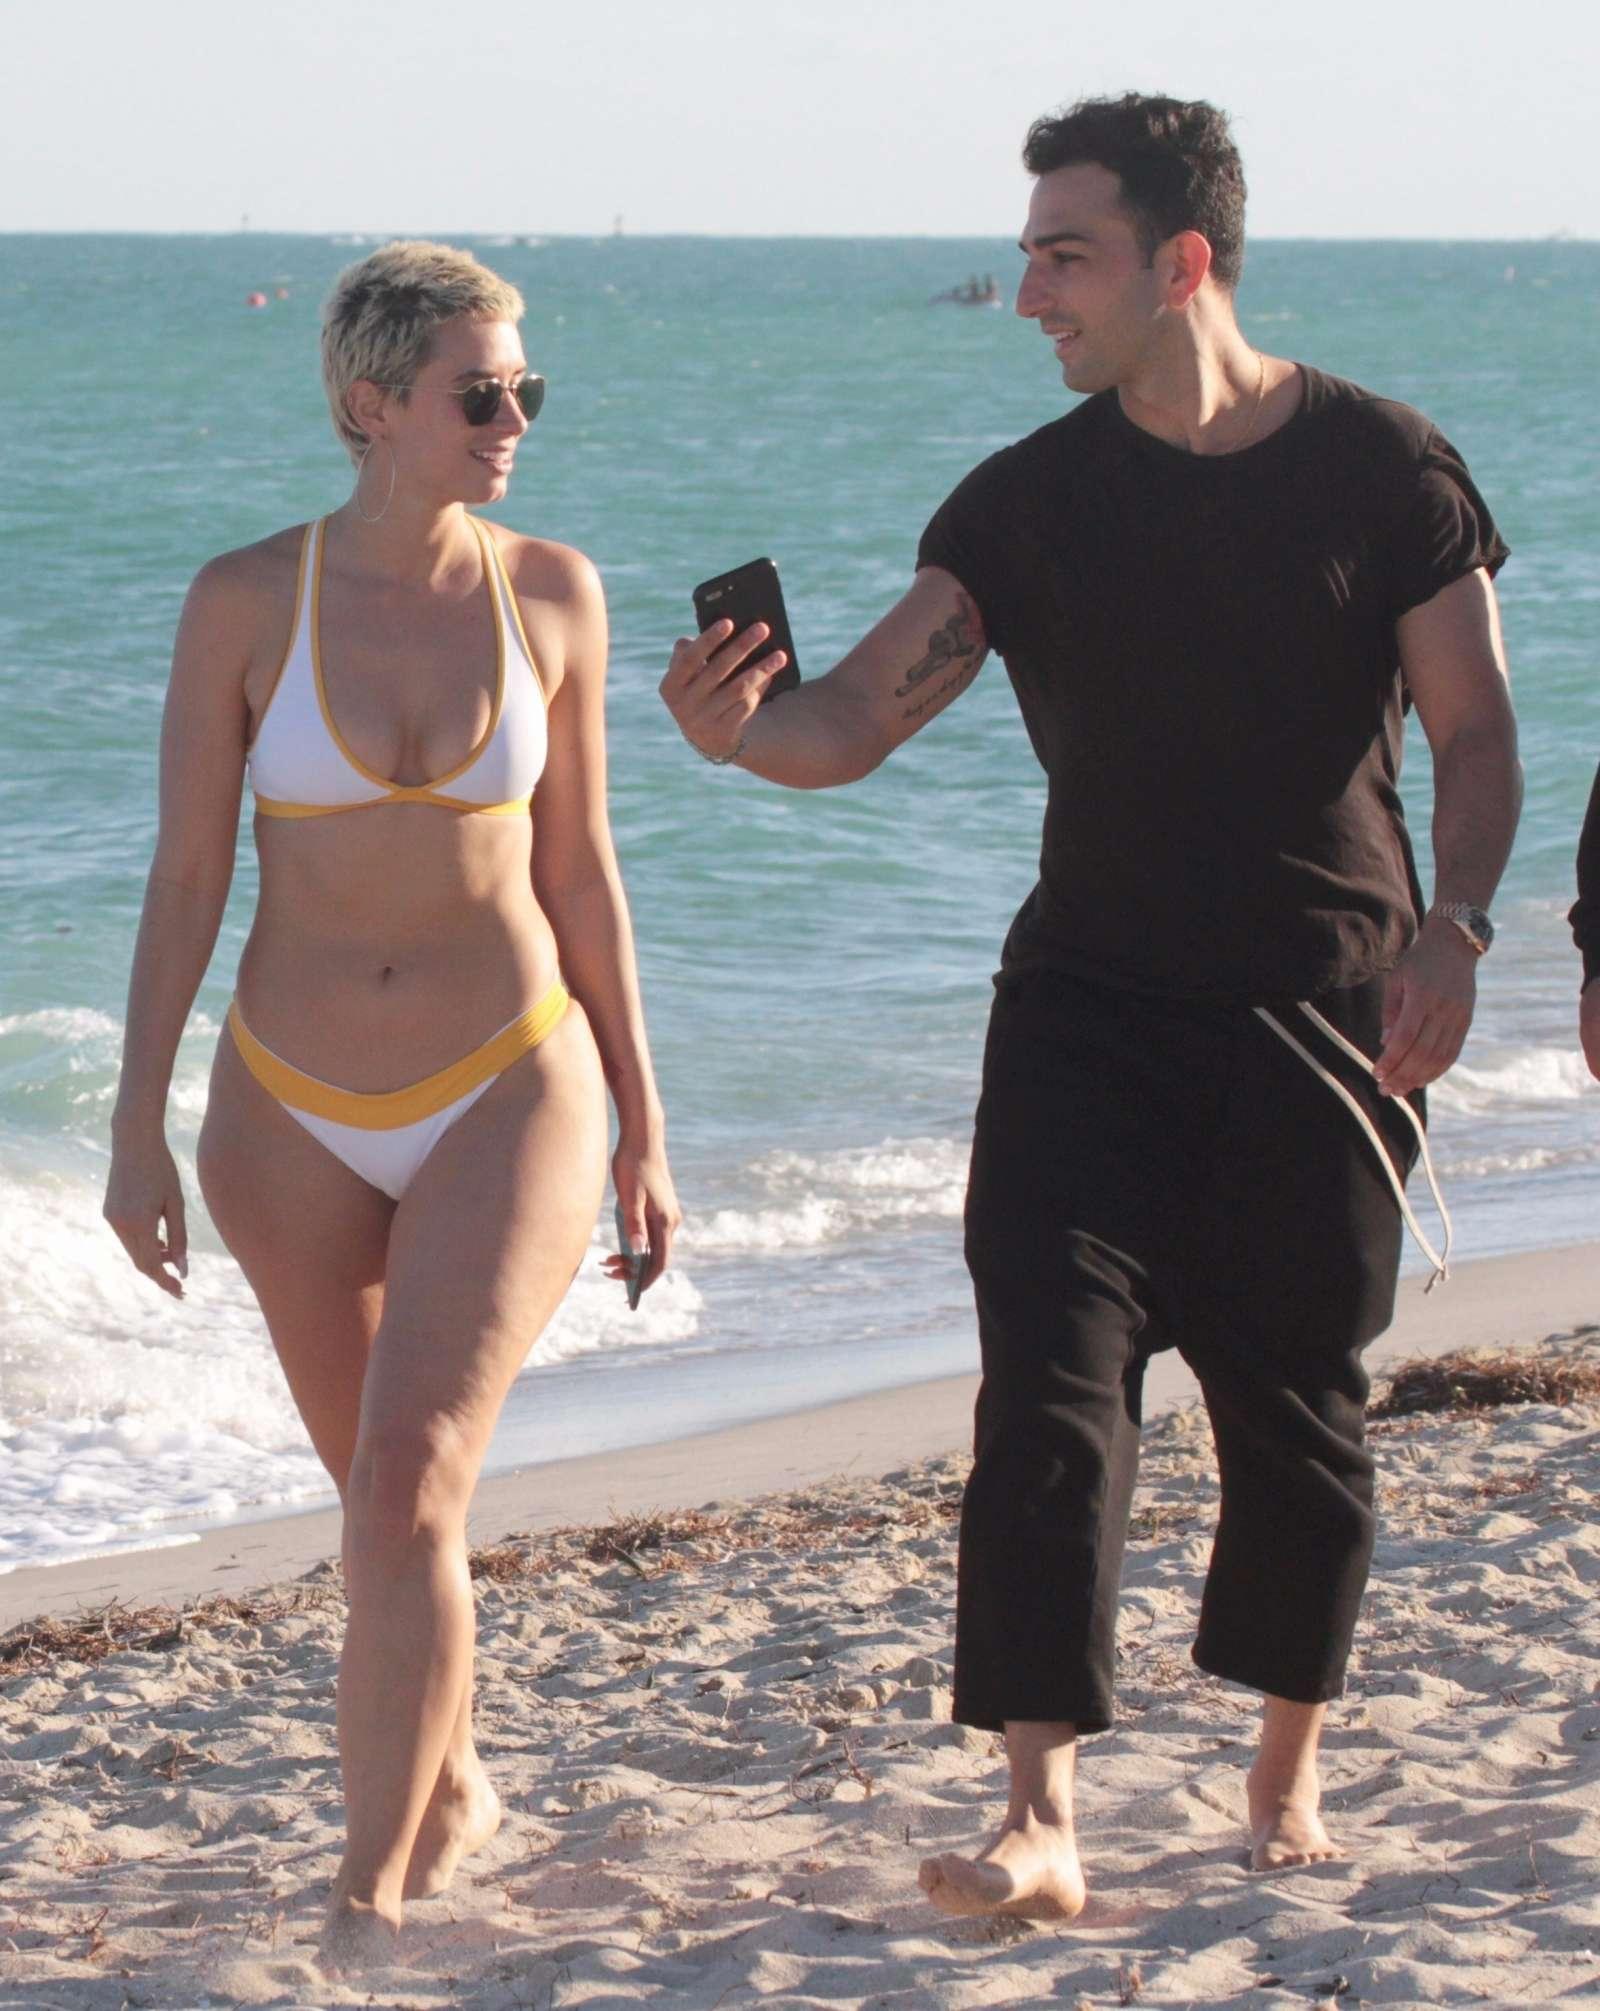 YesJulz in White Bikini on the beach in Miami Pic 21 of 35